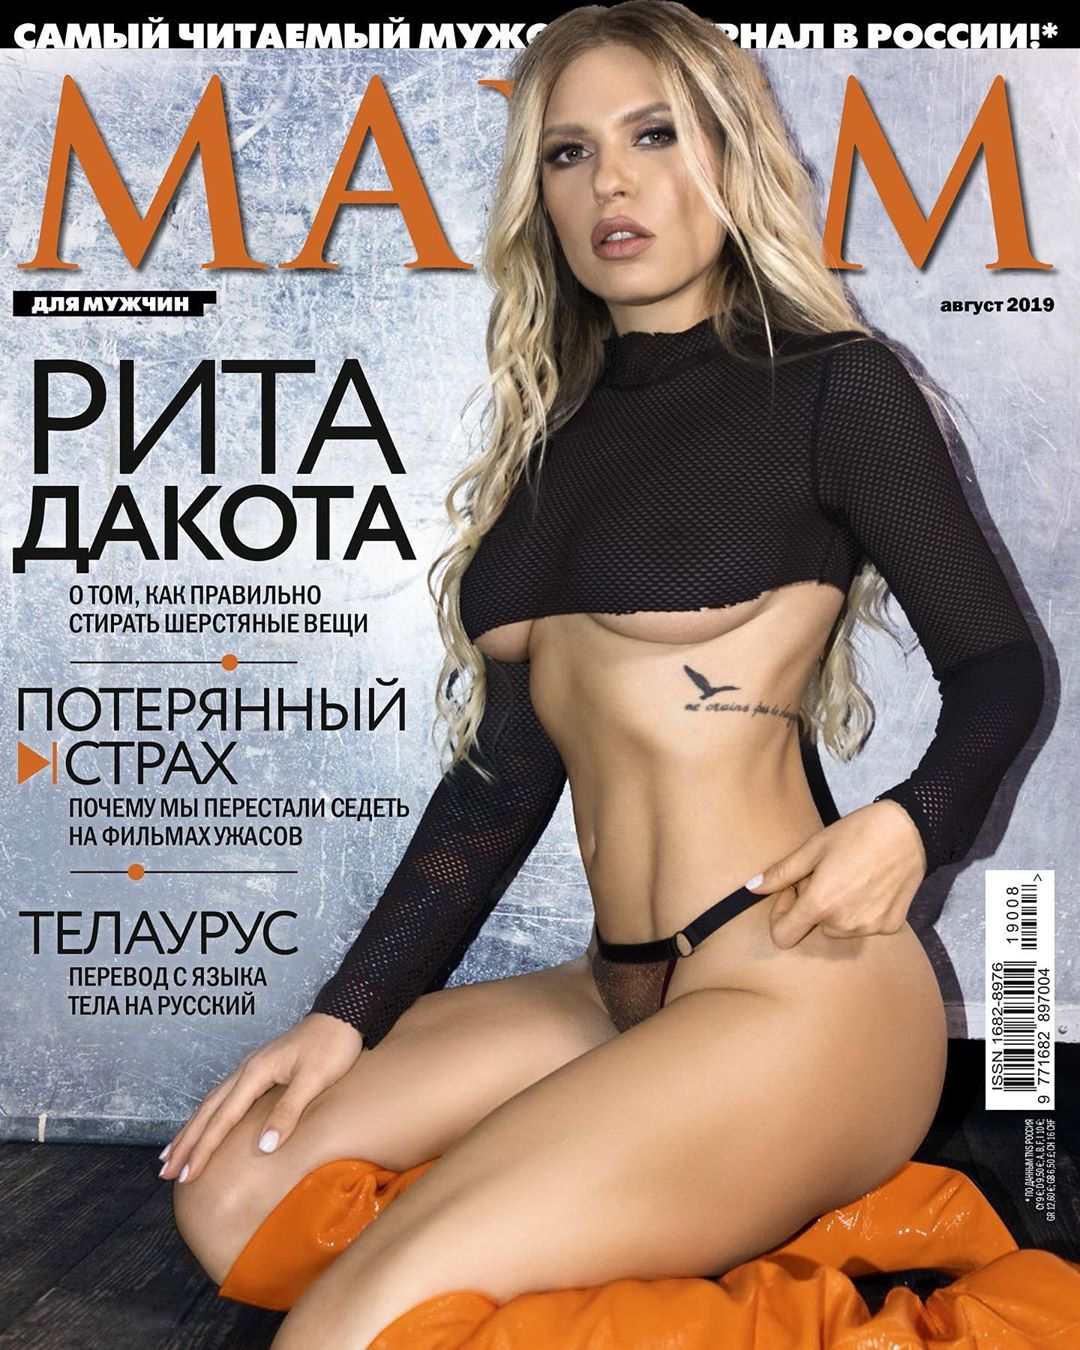 «Огонь, пожар!»: Рита Дакота снялась для обложки мужского журнала